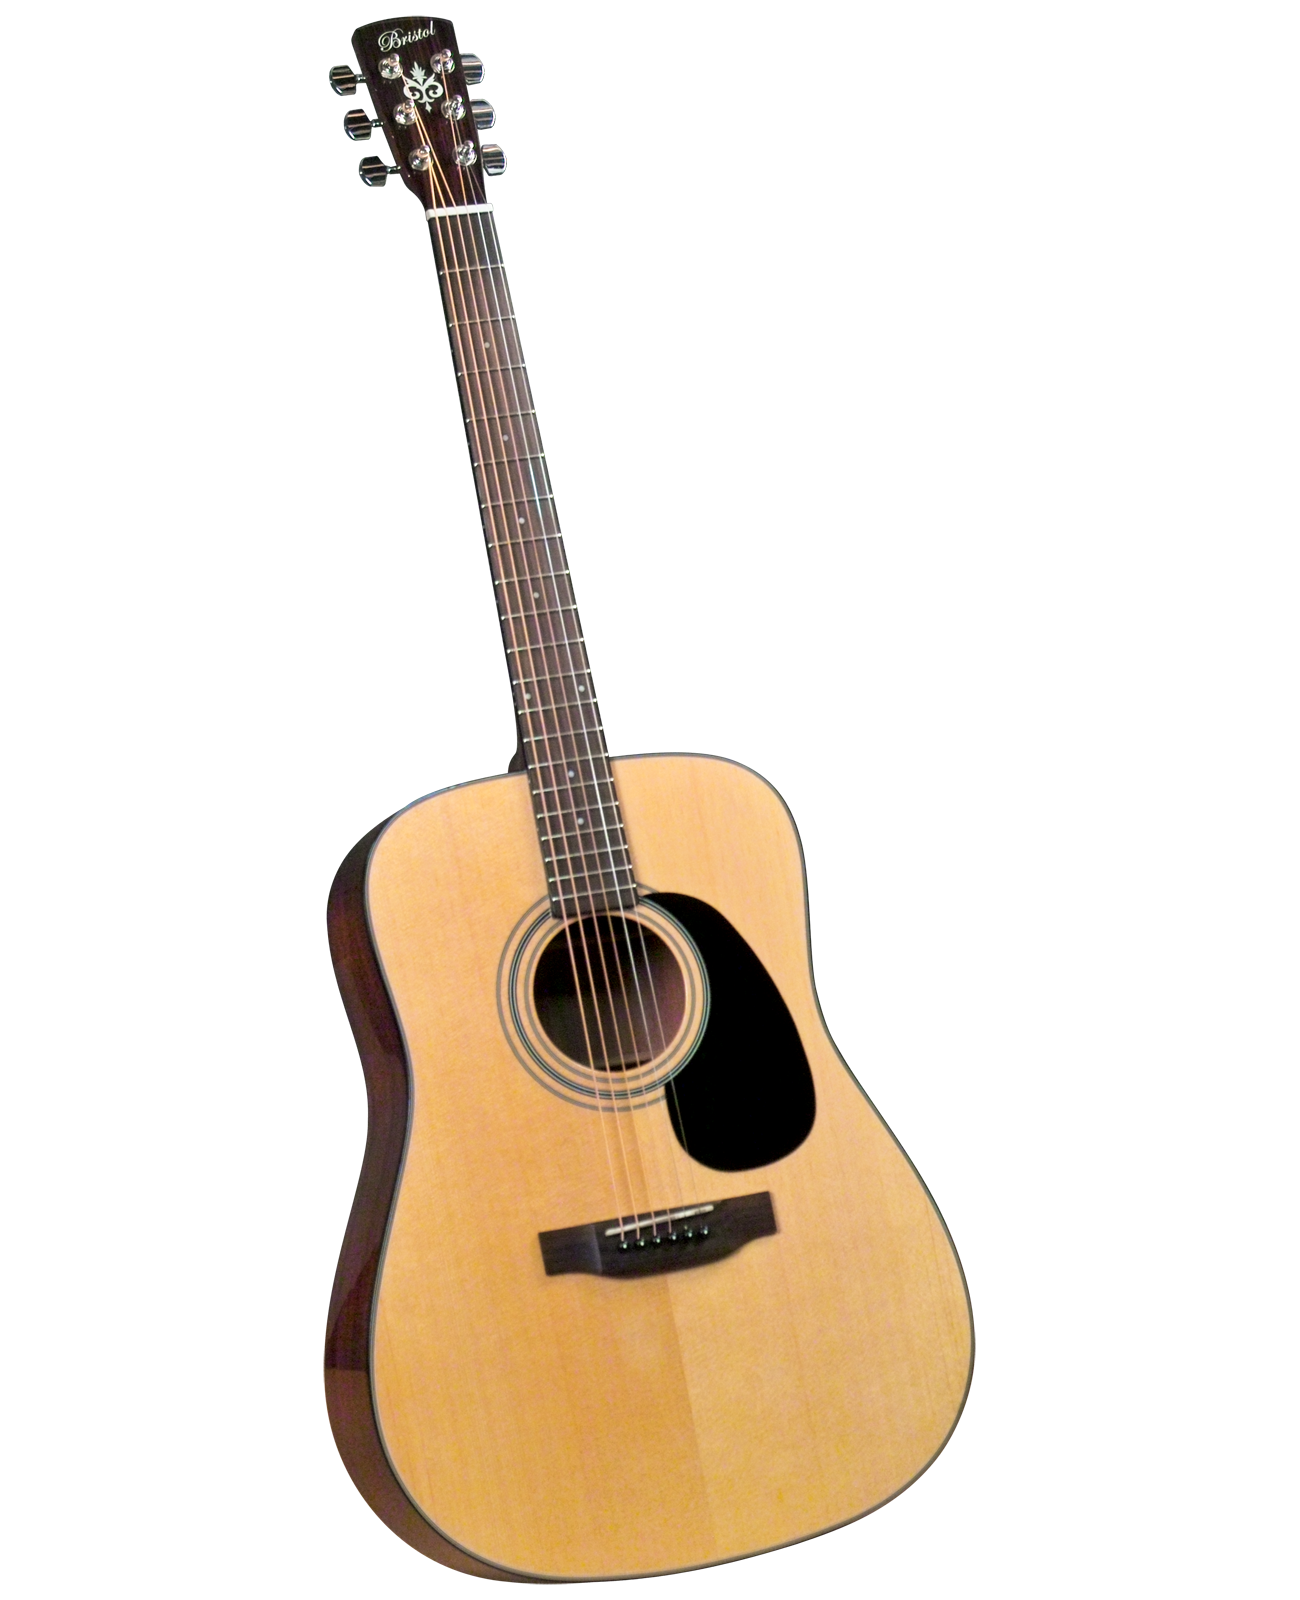 Bristol BD-16 Dreadnought Acoustic Guitar w/ Gig Bag